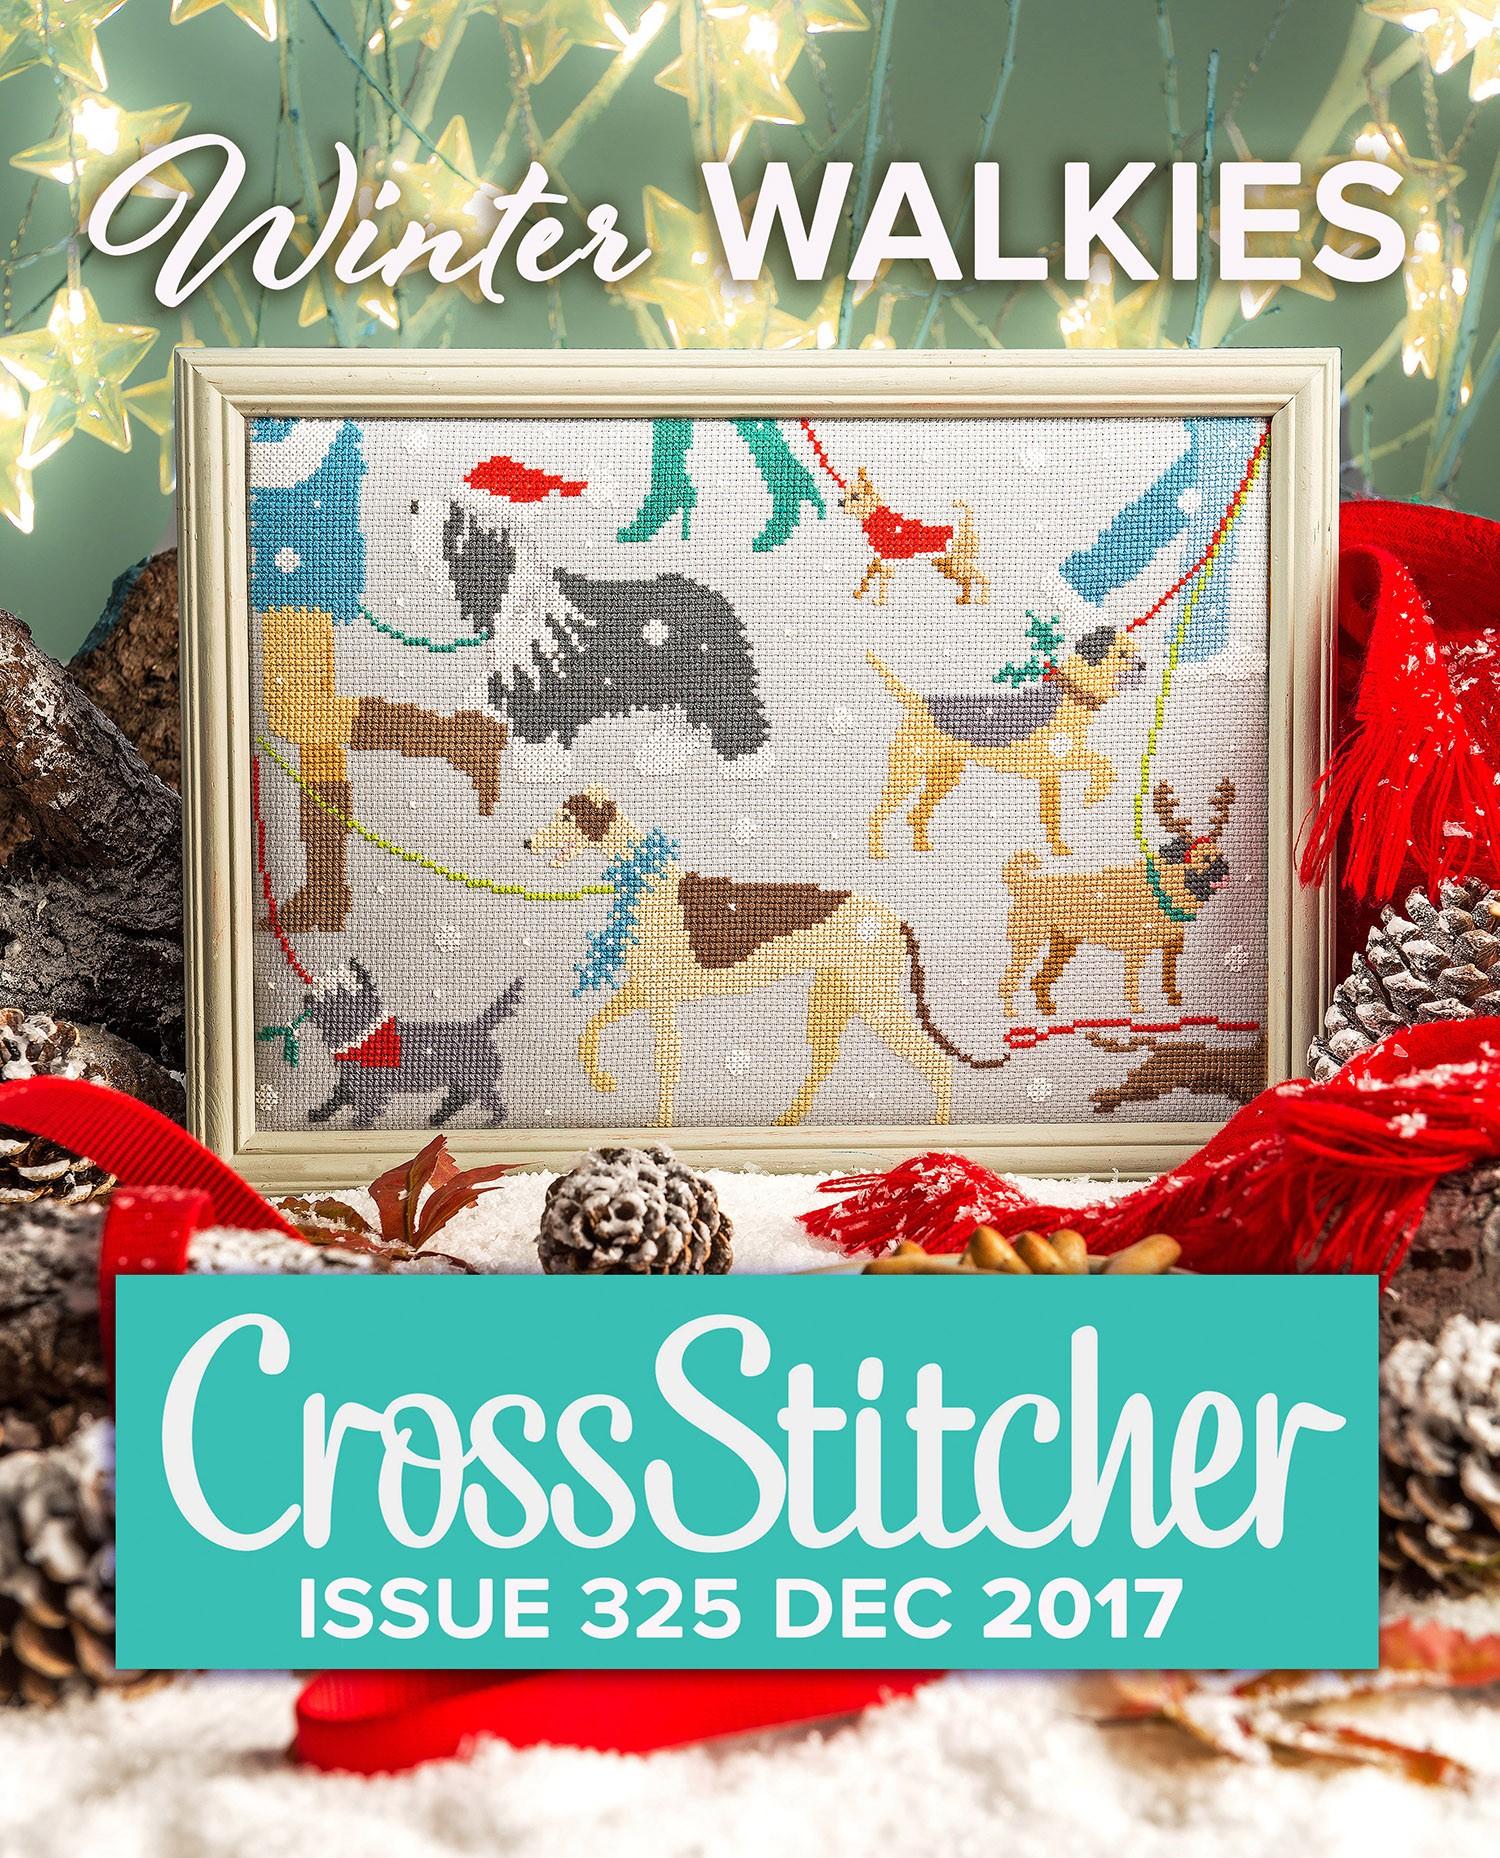 Cross Stitcher Project Pack - Winter Walkies 325